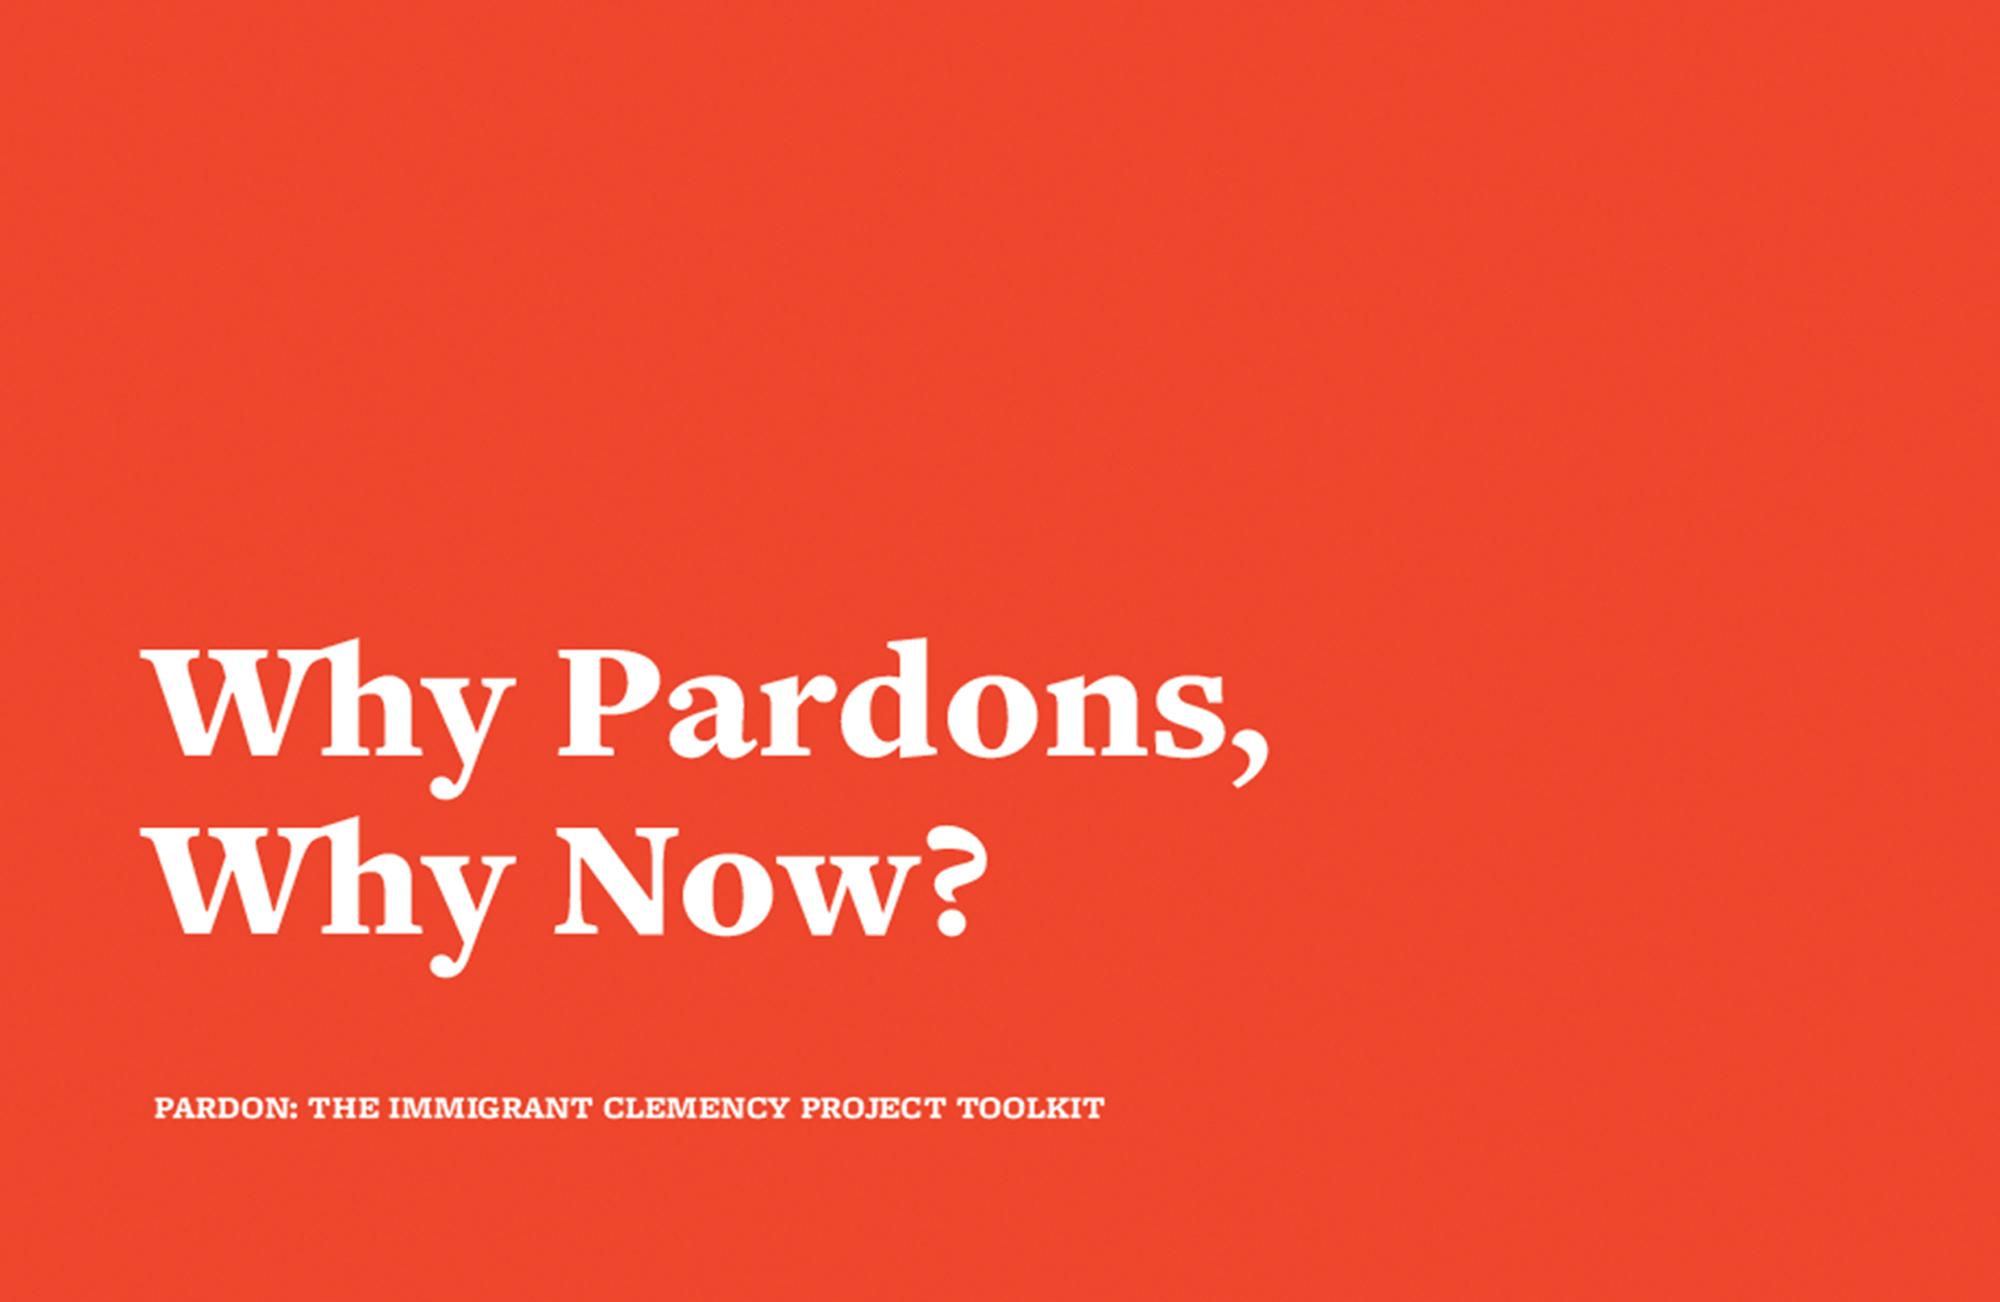 IDC — Pardon Toolkit